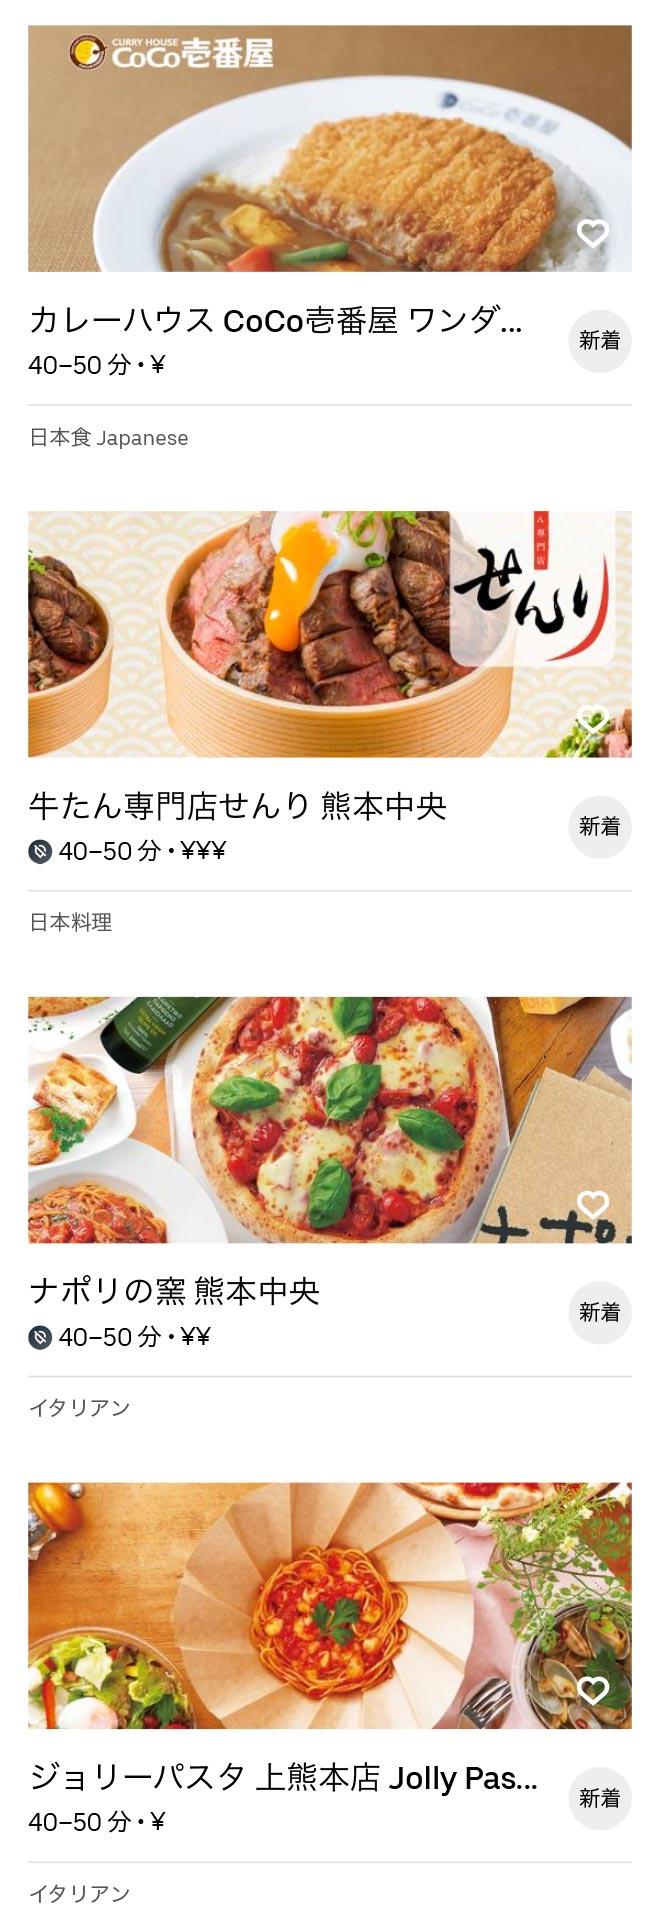 Kumamoto menu 2008 06